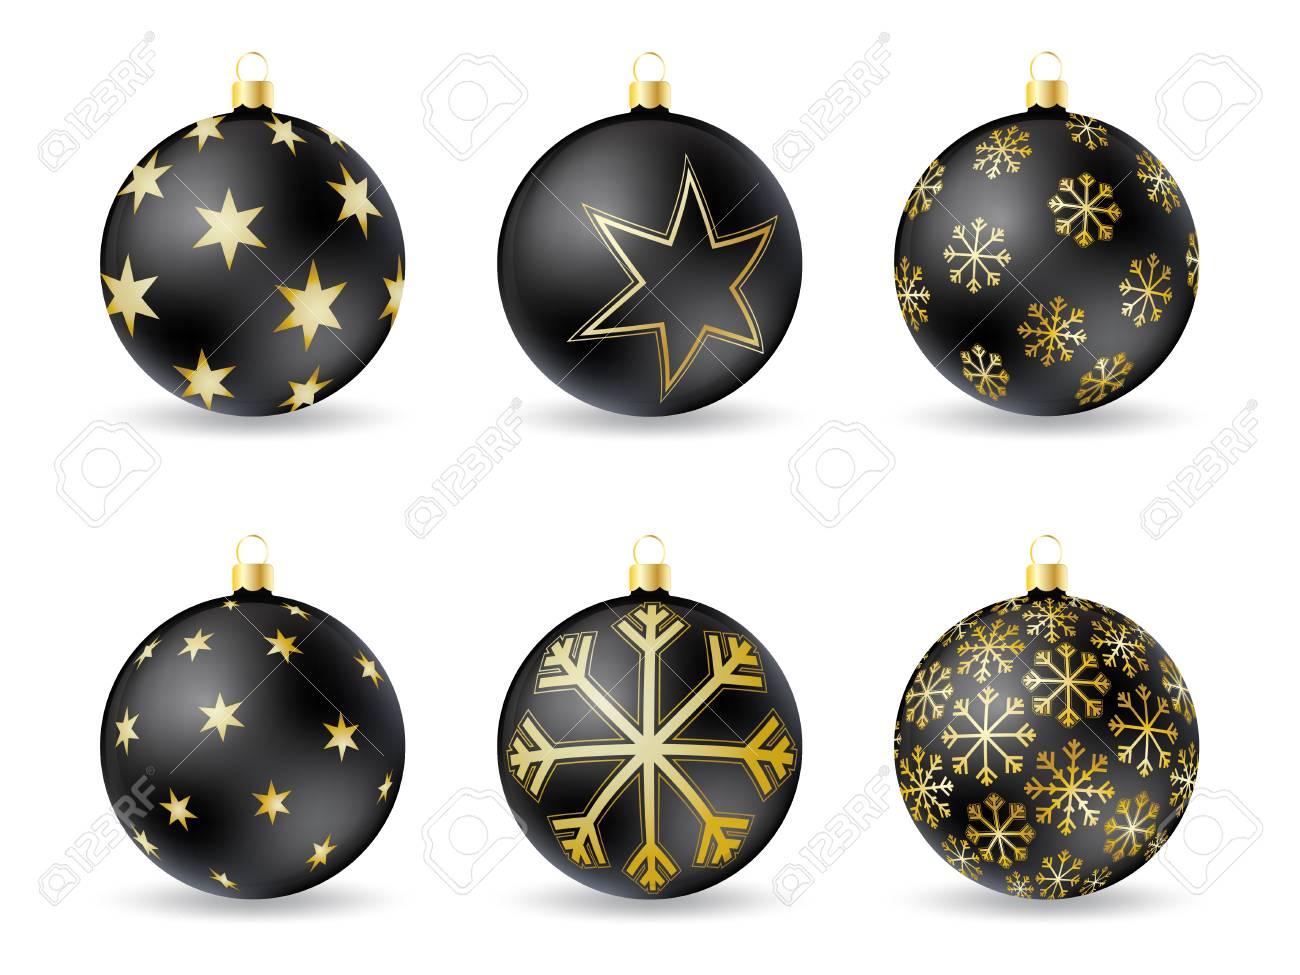 Black Christmas Balls.Set Of Black Christmas Balls With Decorative Winter Ornament